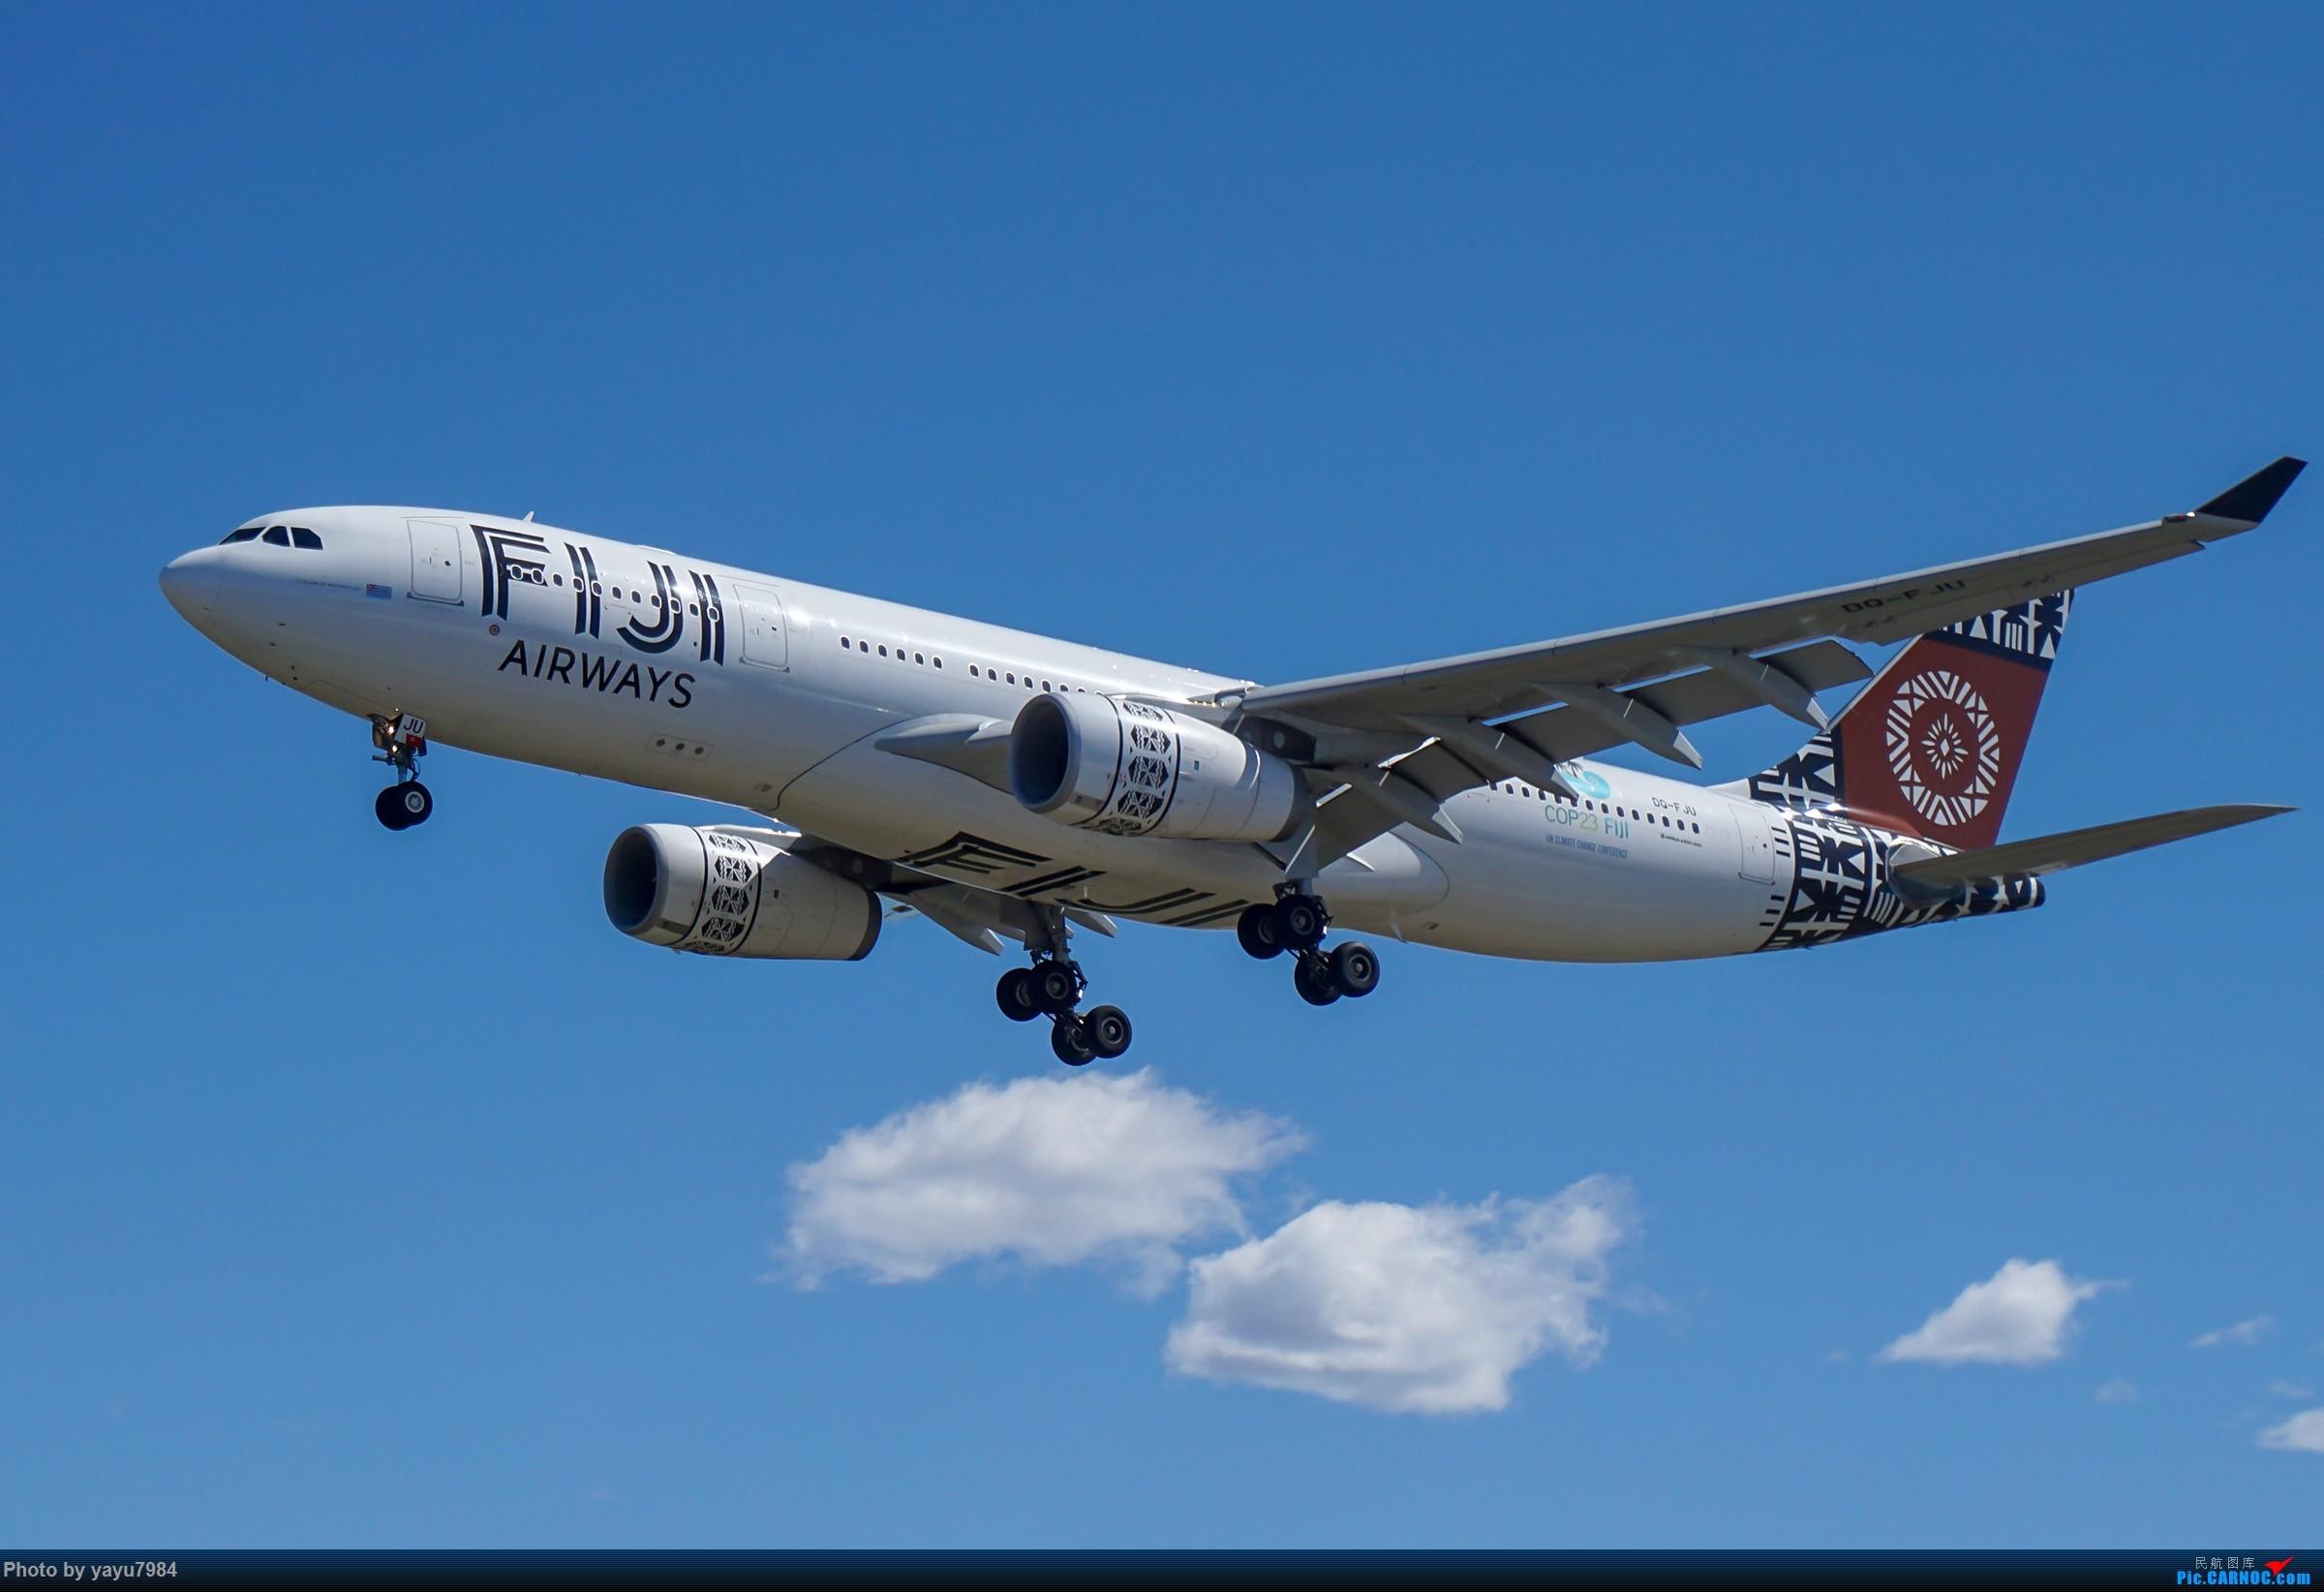 Re:[原创][SYD] 东航天合332,雪绒花343,华航蓝鹊,以及其他日常货 AIRBUS A330-200 DQ-FJU 澳大利亚悉尼金斯福德·史密斯机场